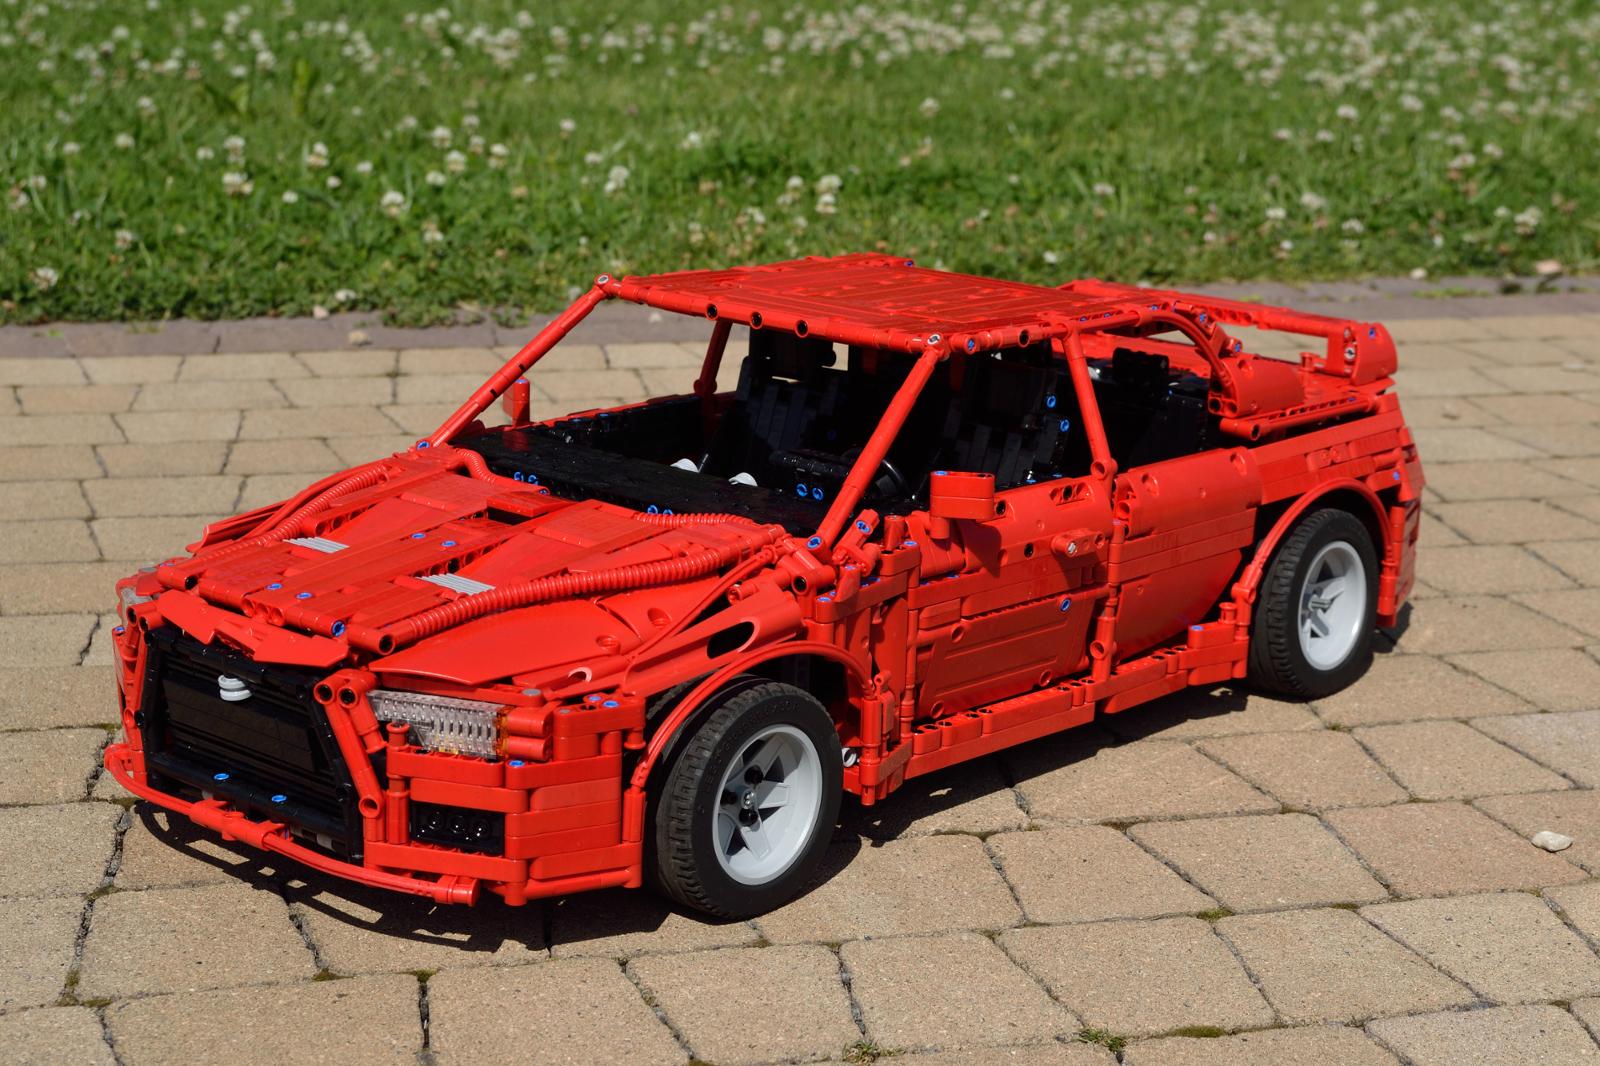 Mitsubishi Lancer Evo X 1:8 - LEGO Technic, Mindstorms & Model Team - Eurobricks Forums